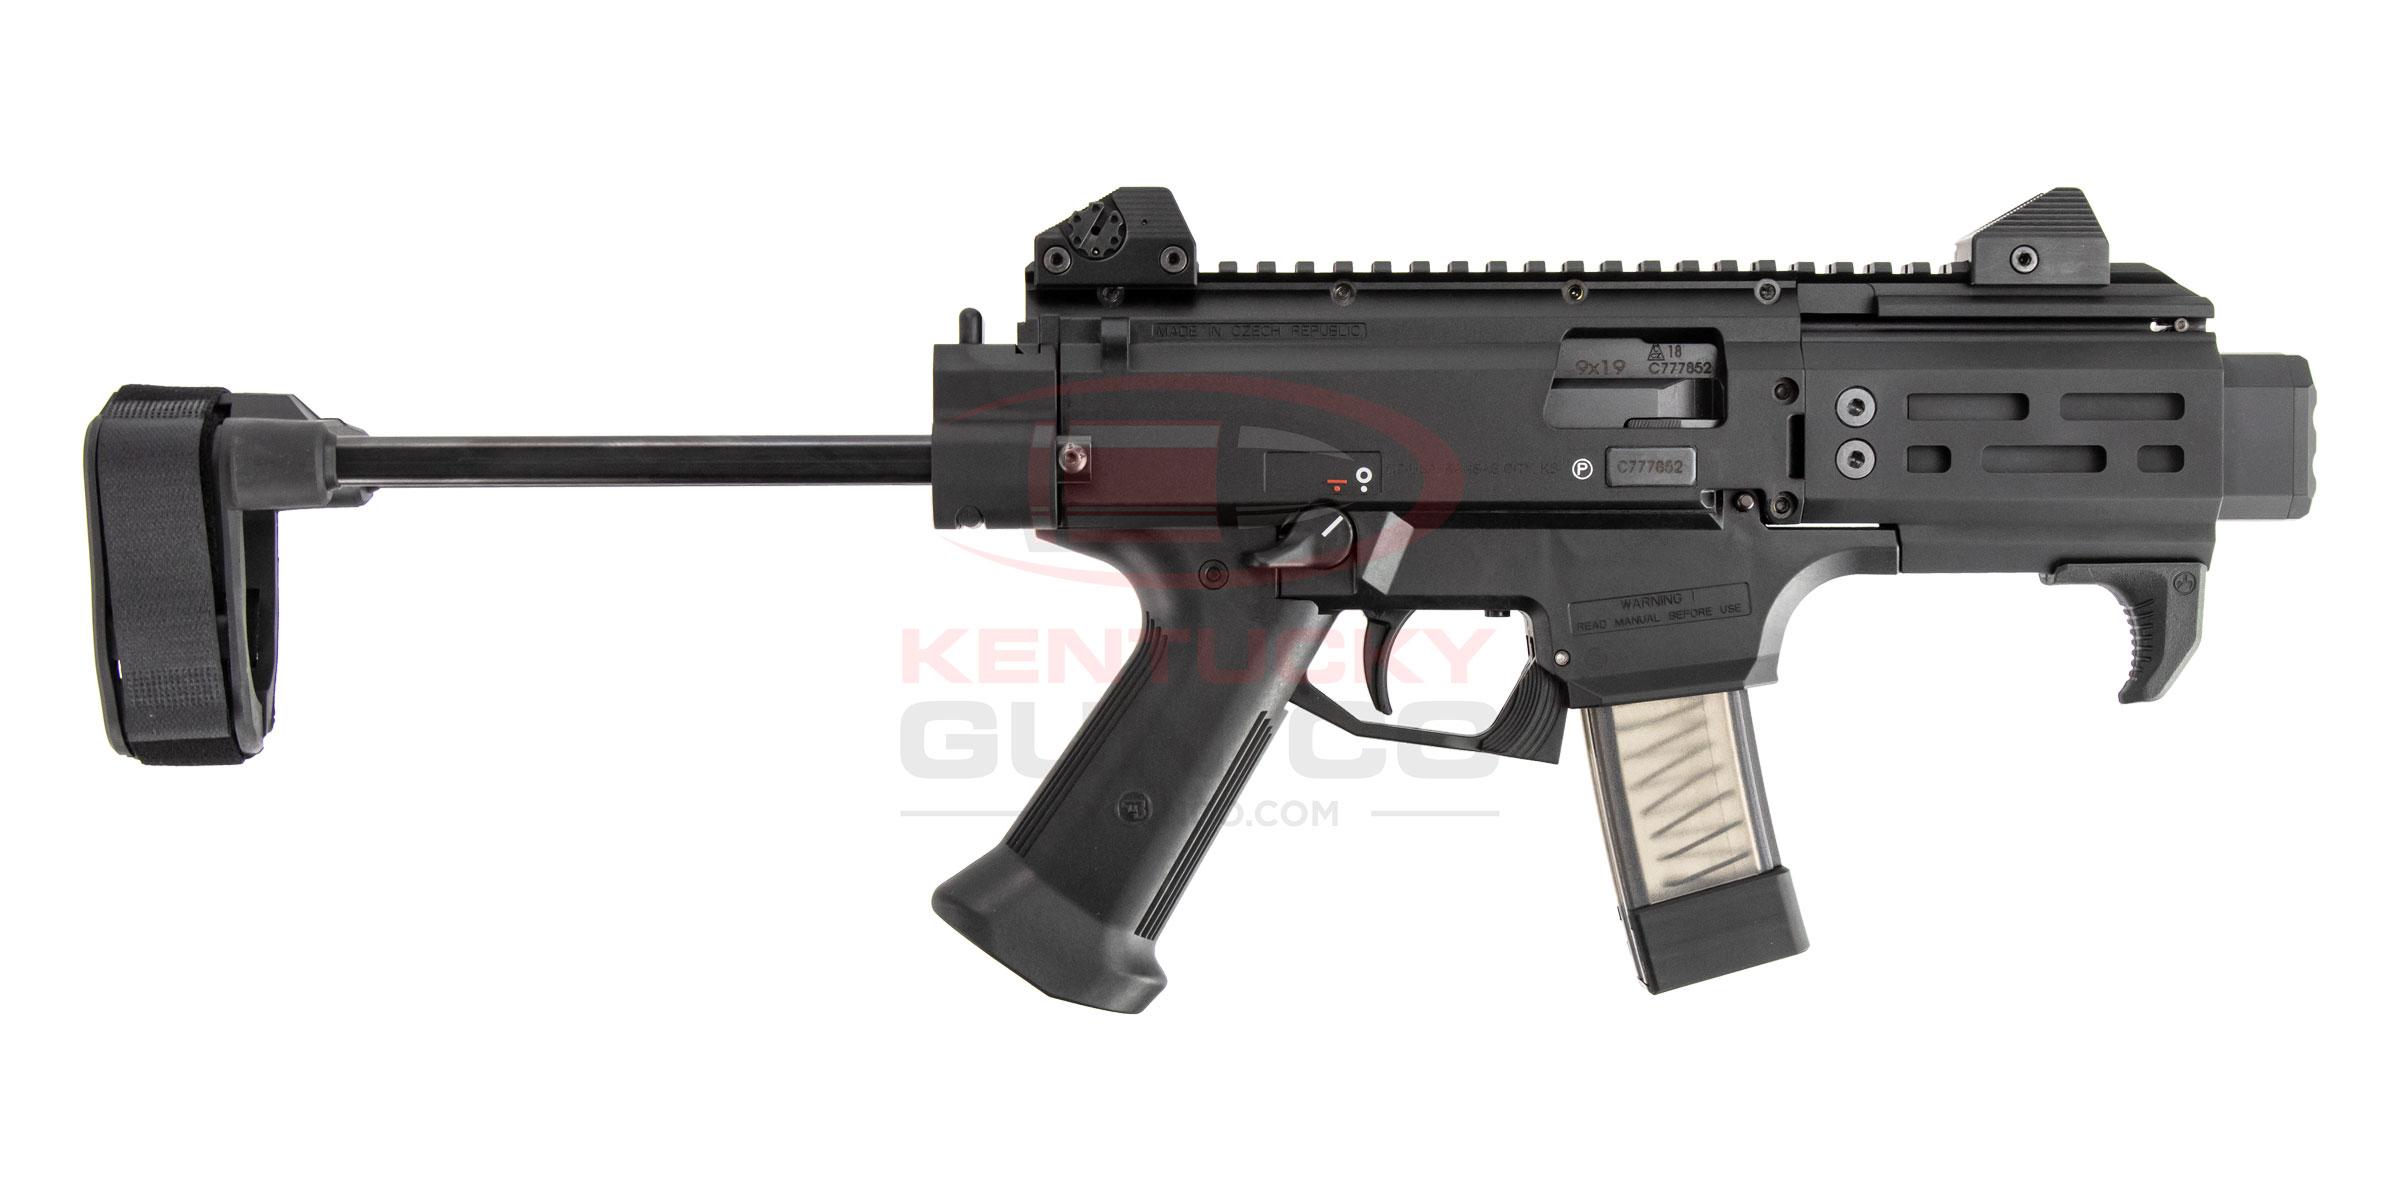 Scorpion EVO 3 S2 Pistol Micro